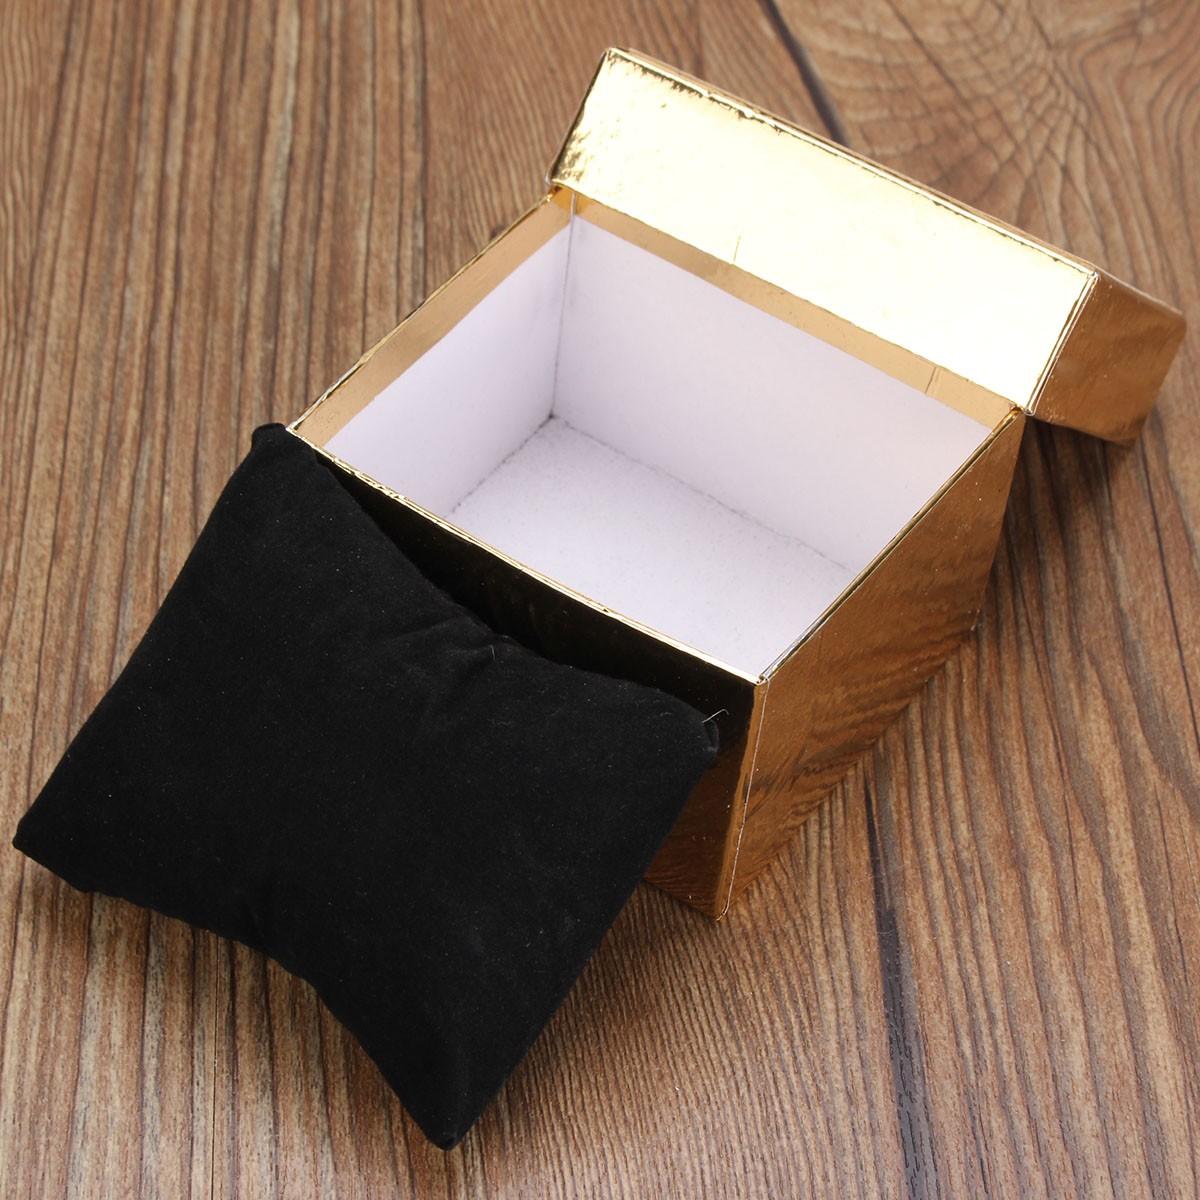 Bowknot Bracelet Bangle Square Jewelry Wrist Watch Cardboard Packing Box